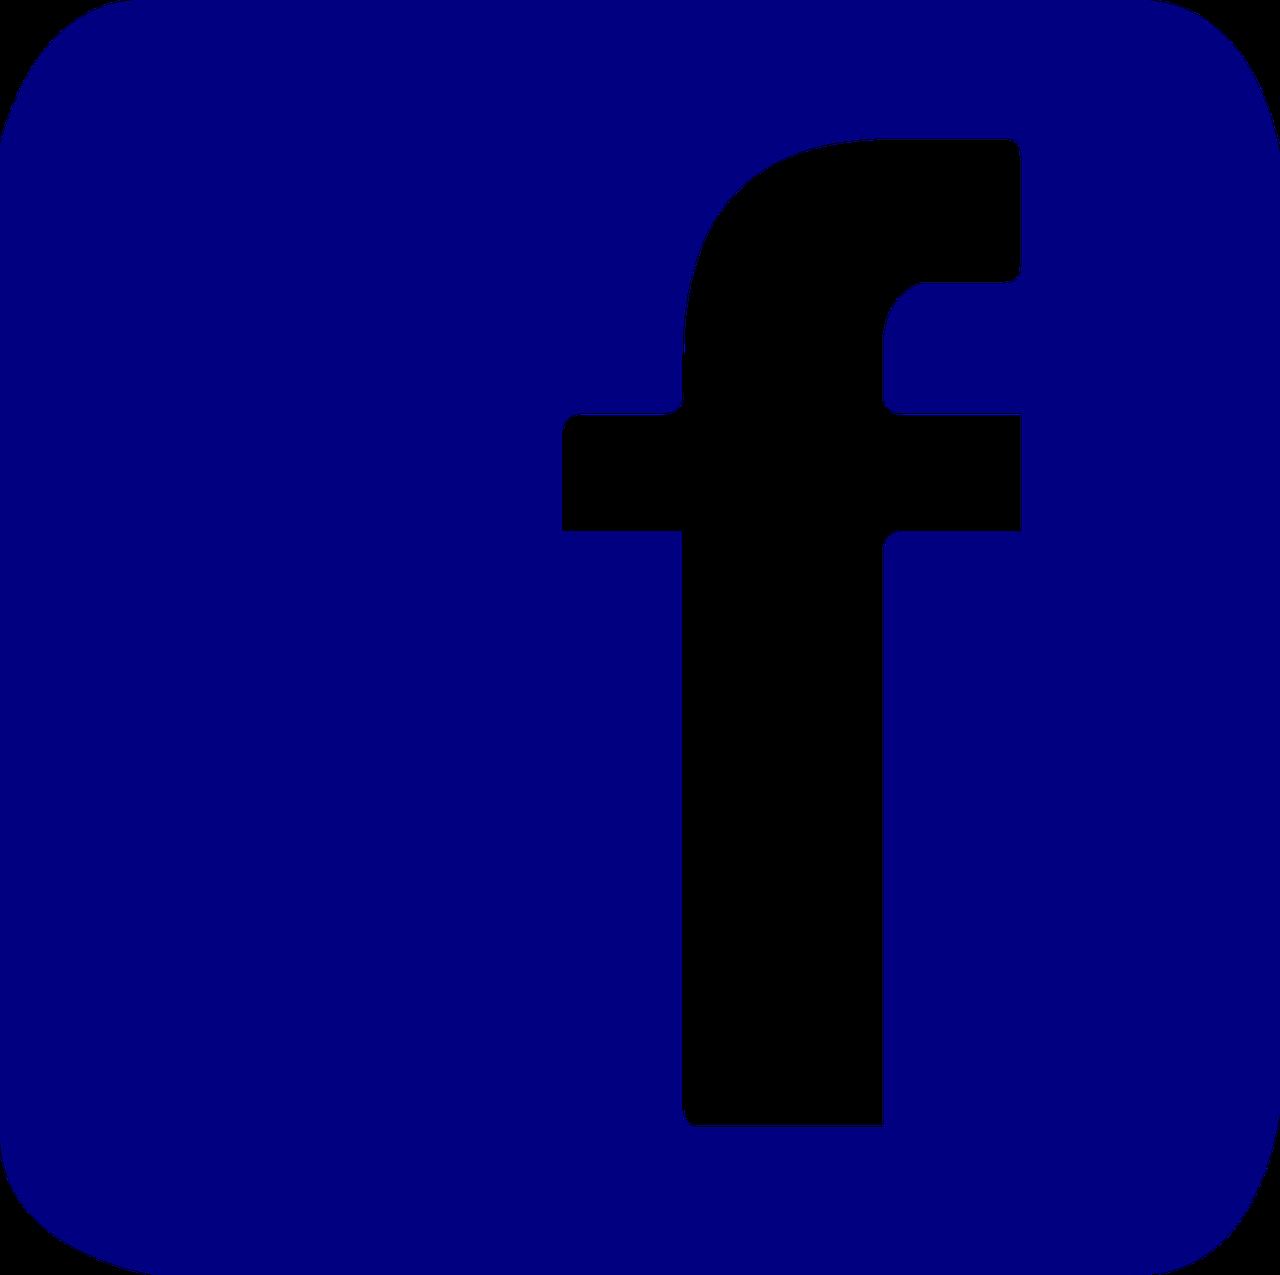 Facebook Latest Version Download With Saimapks Saim Apks